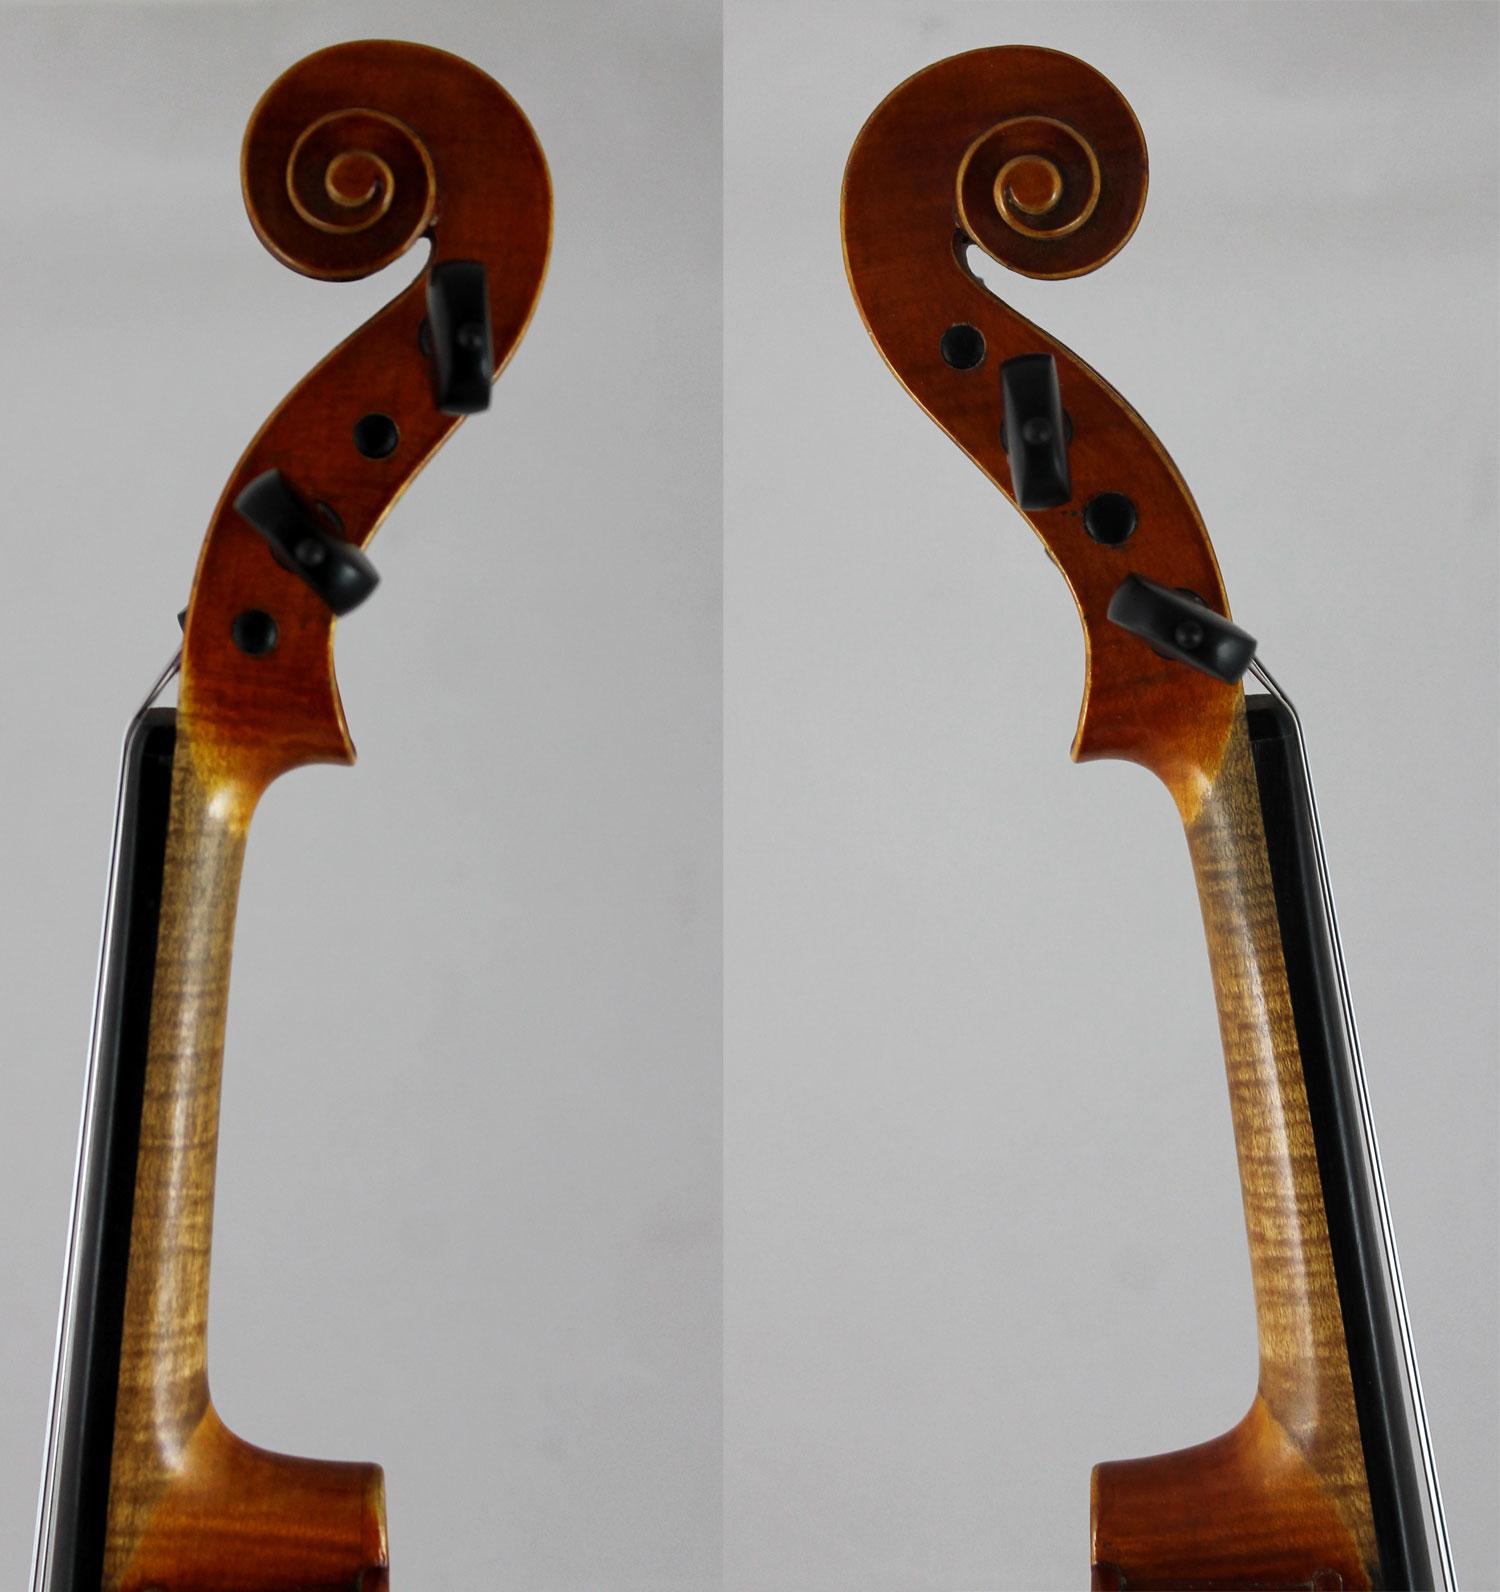 Heinrich Th Heberlein Jr violin - scroll